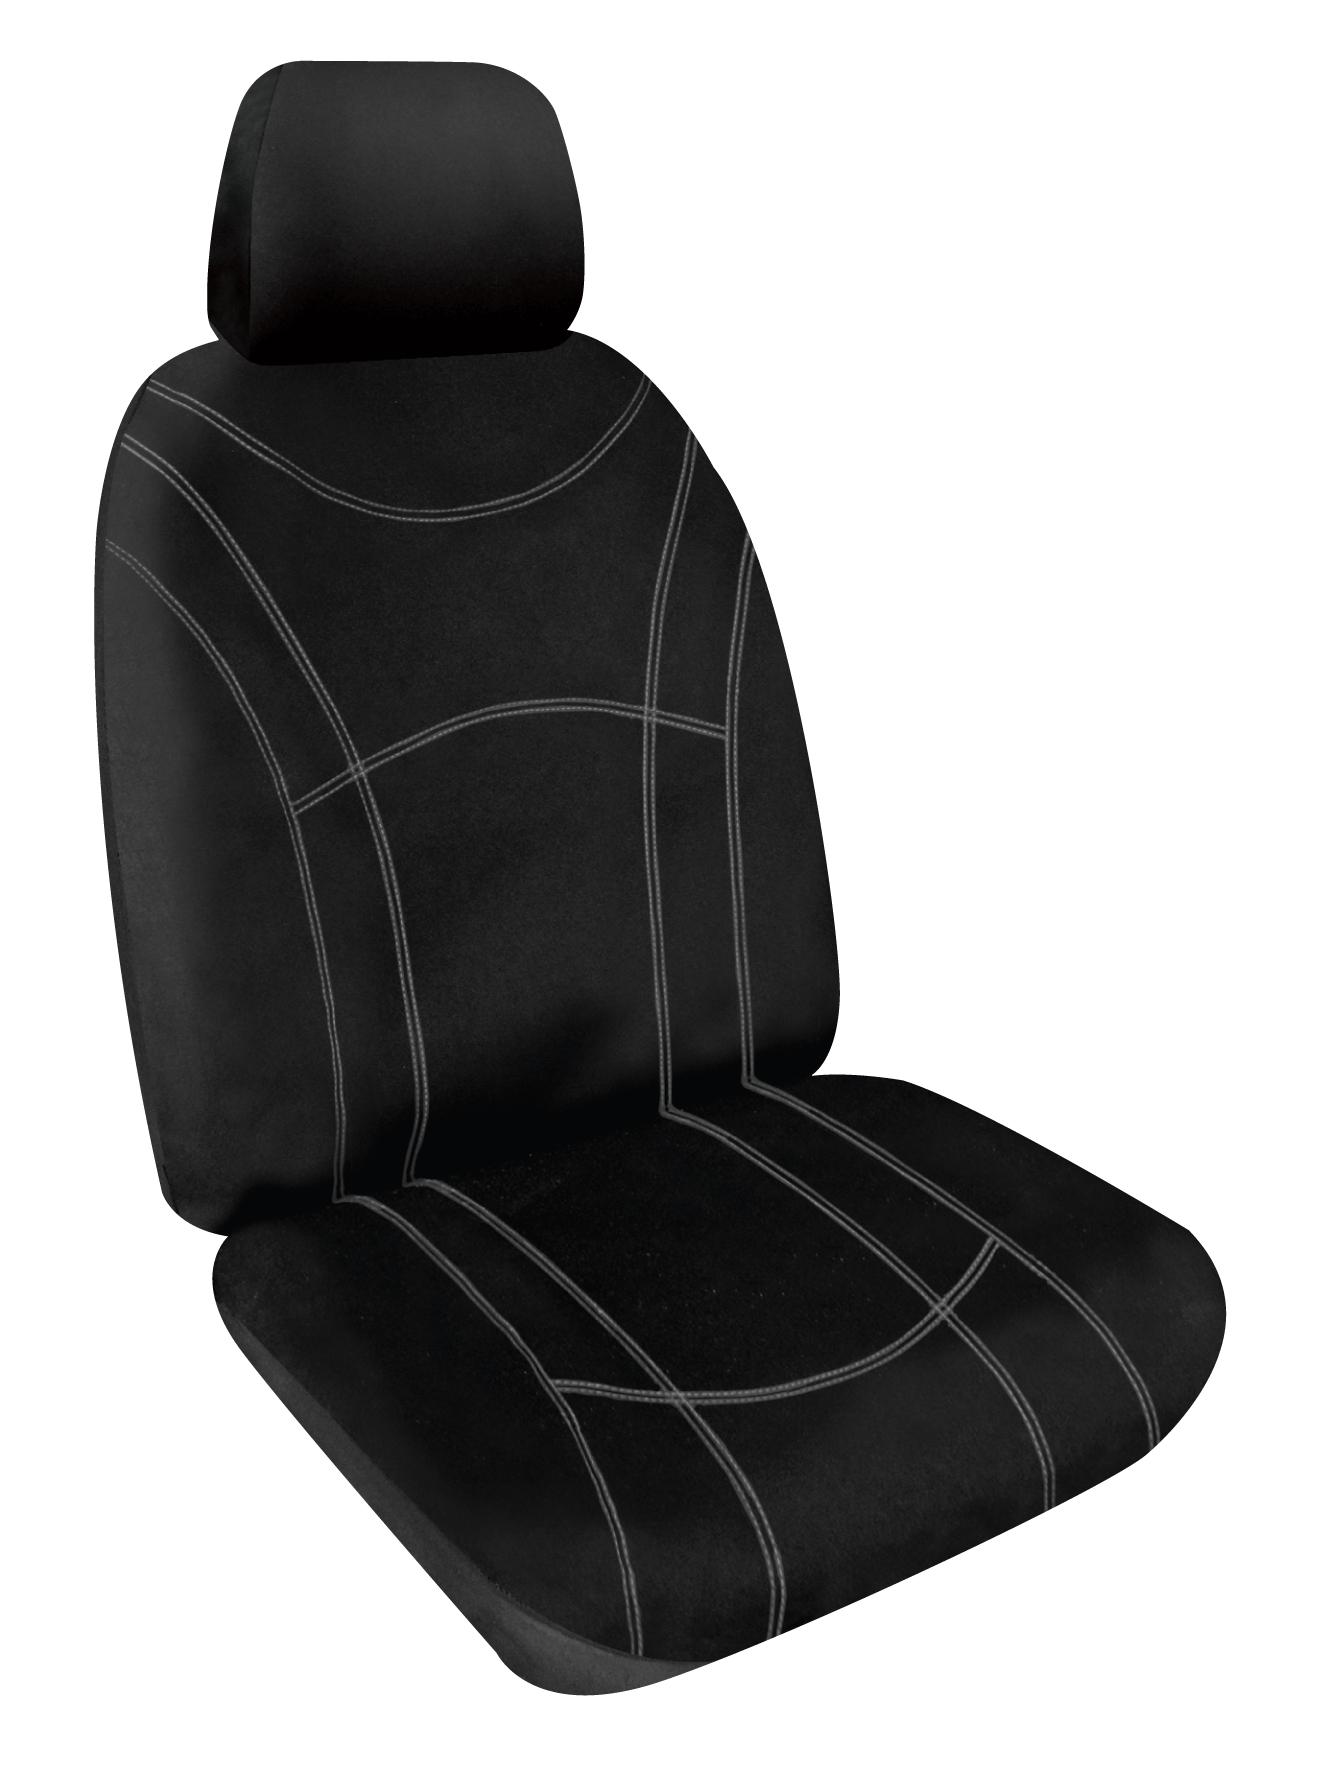 Excellent Neoprene Waterproof Car Seat Covers Machost Co Dining Chair Design Ideas Machostcouk